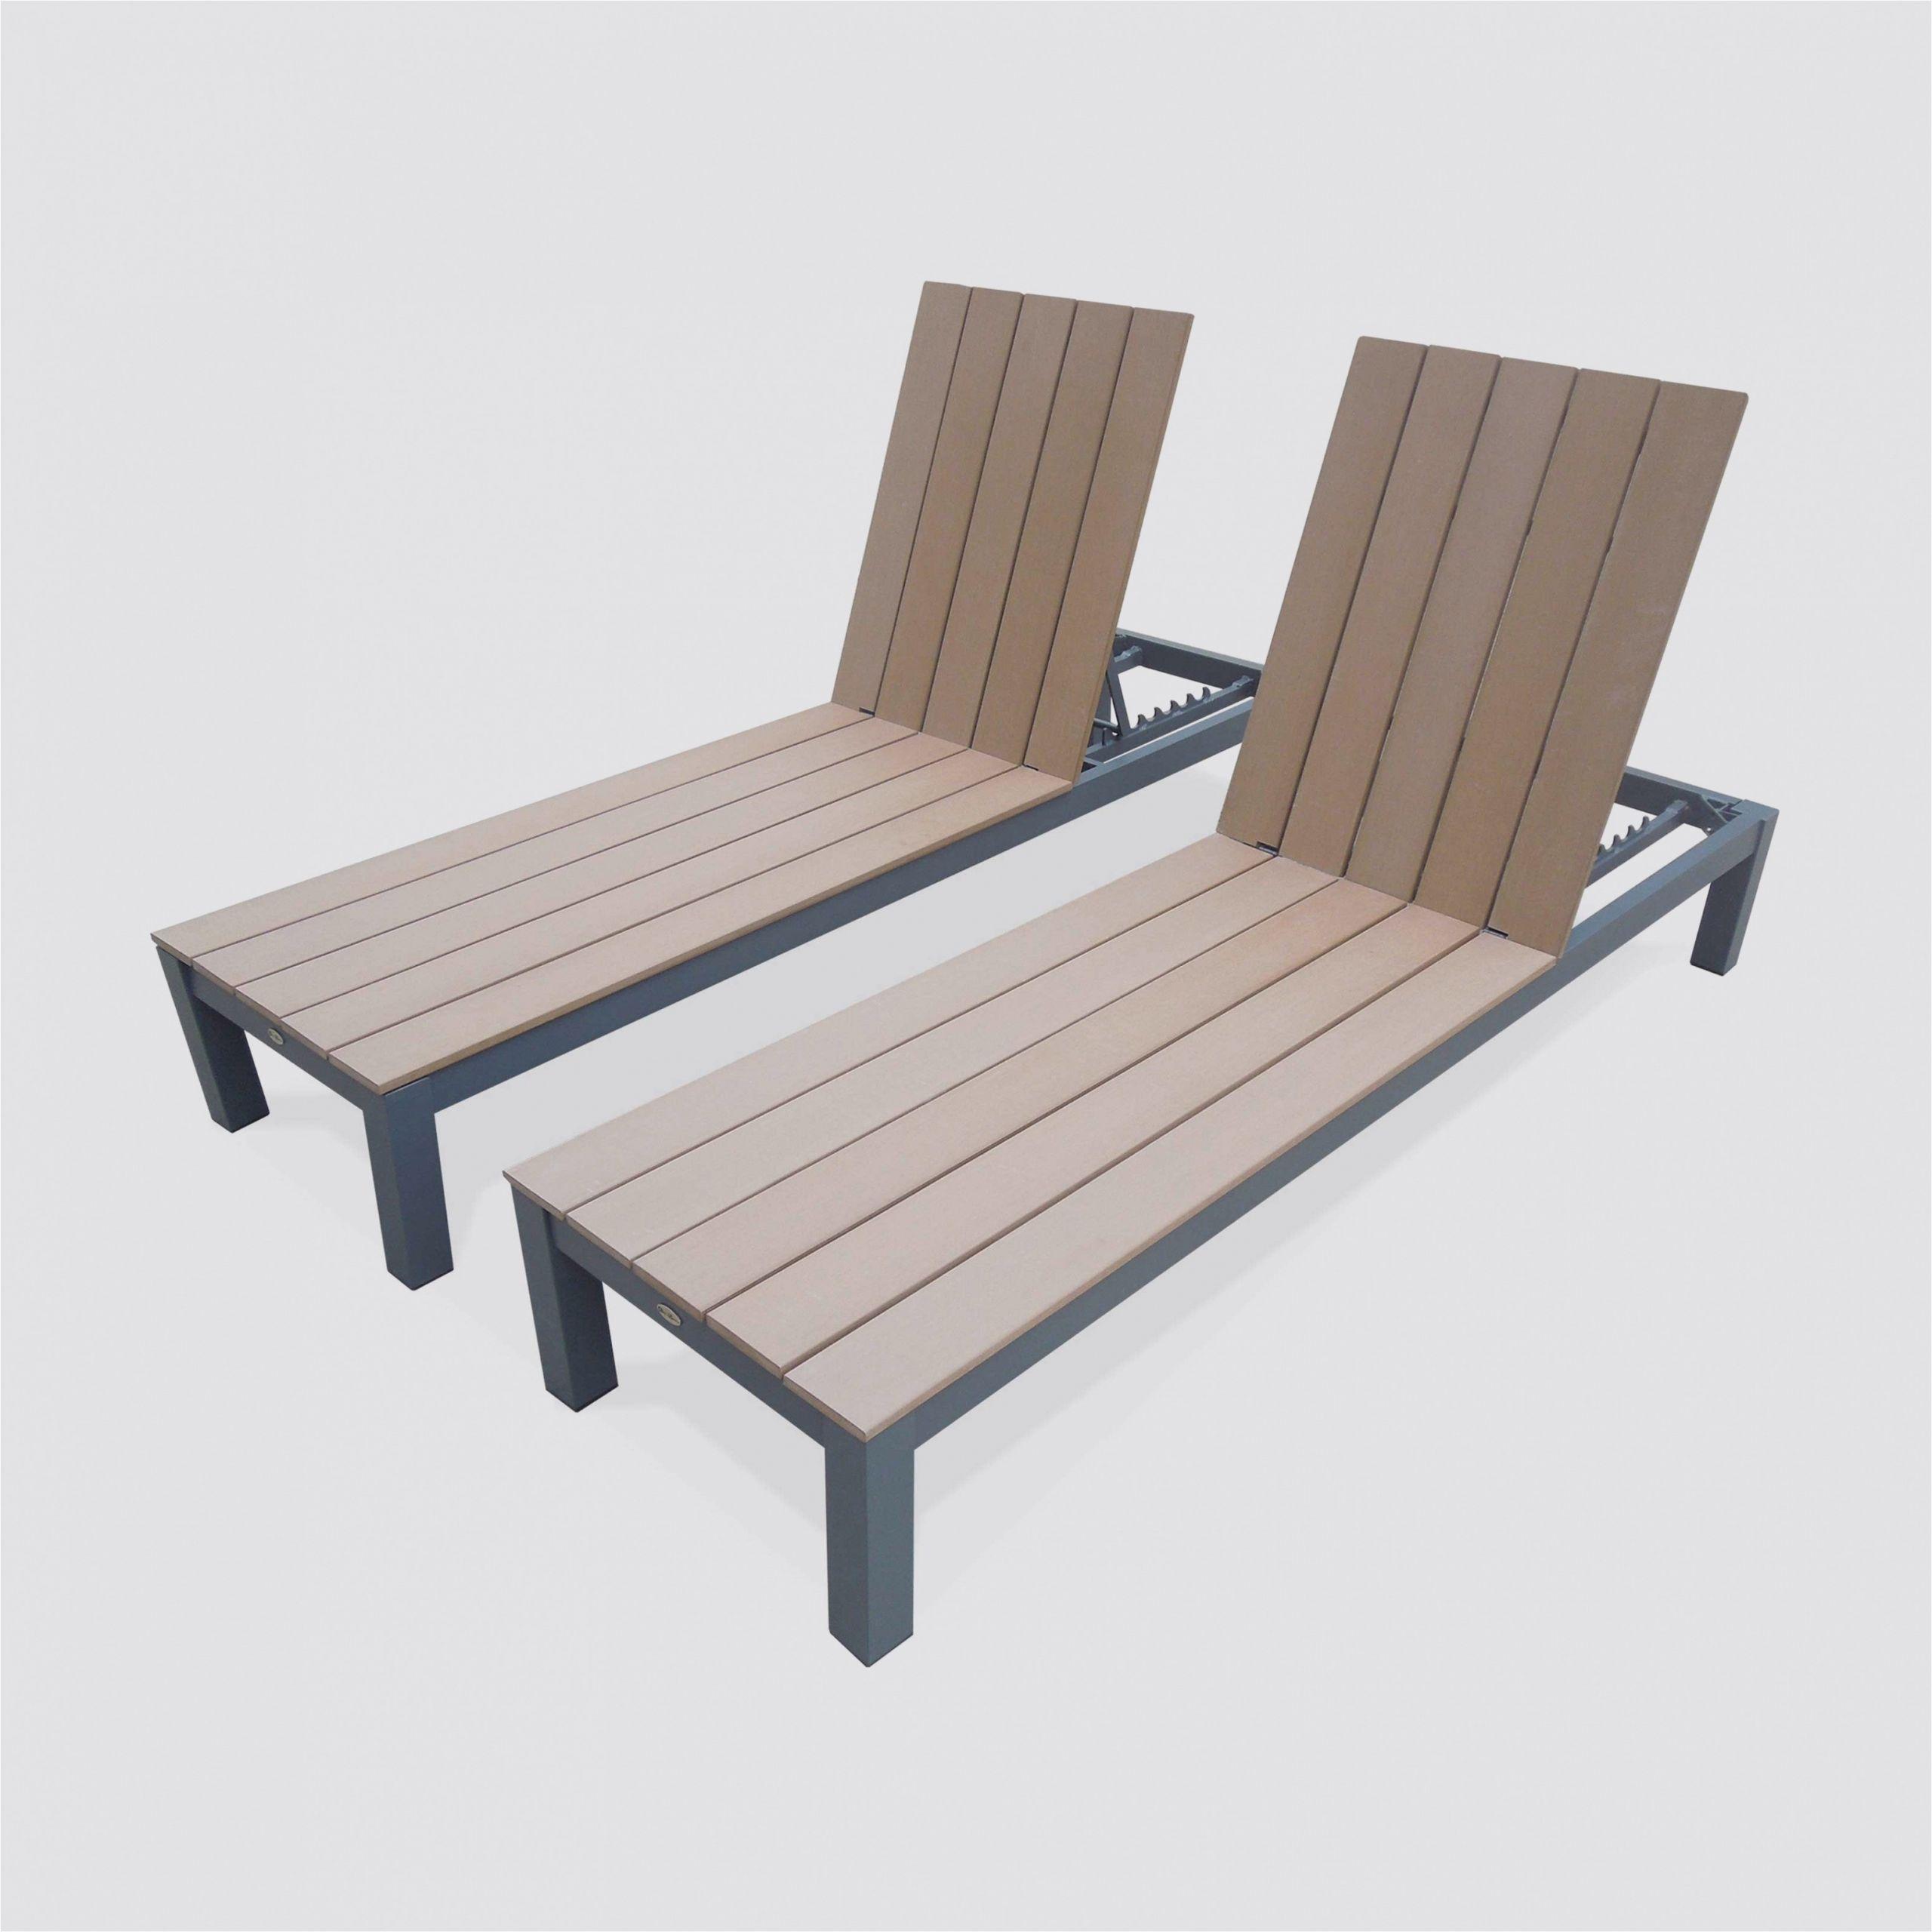 chaise longue jardin bois inspirant transat de jardin pas cher chaise longue en bois de chaise longue jardin bois scaled